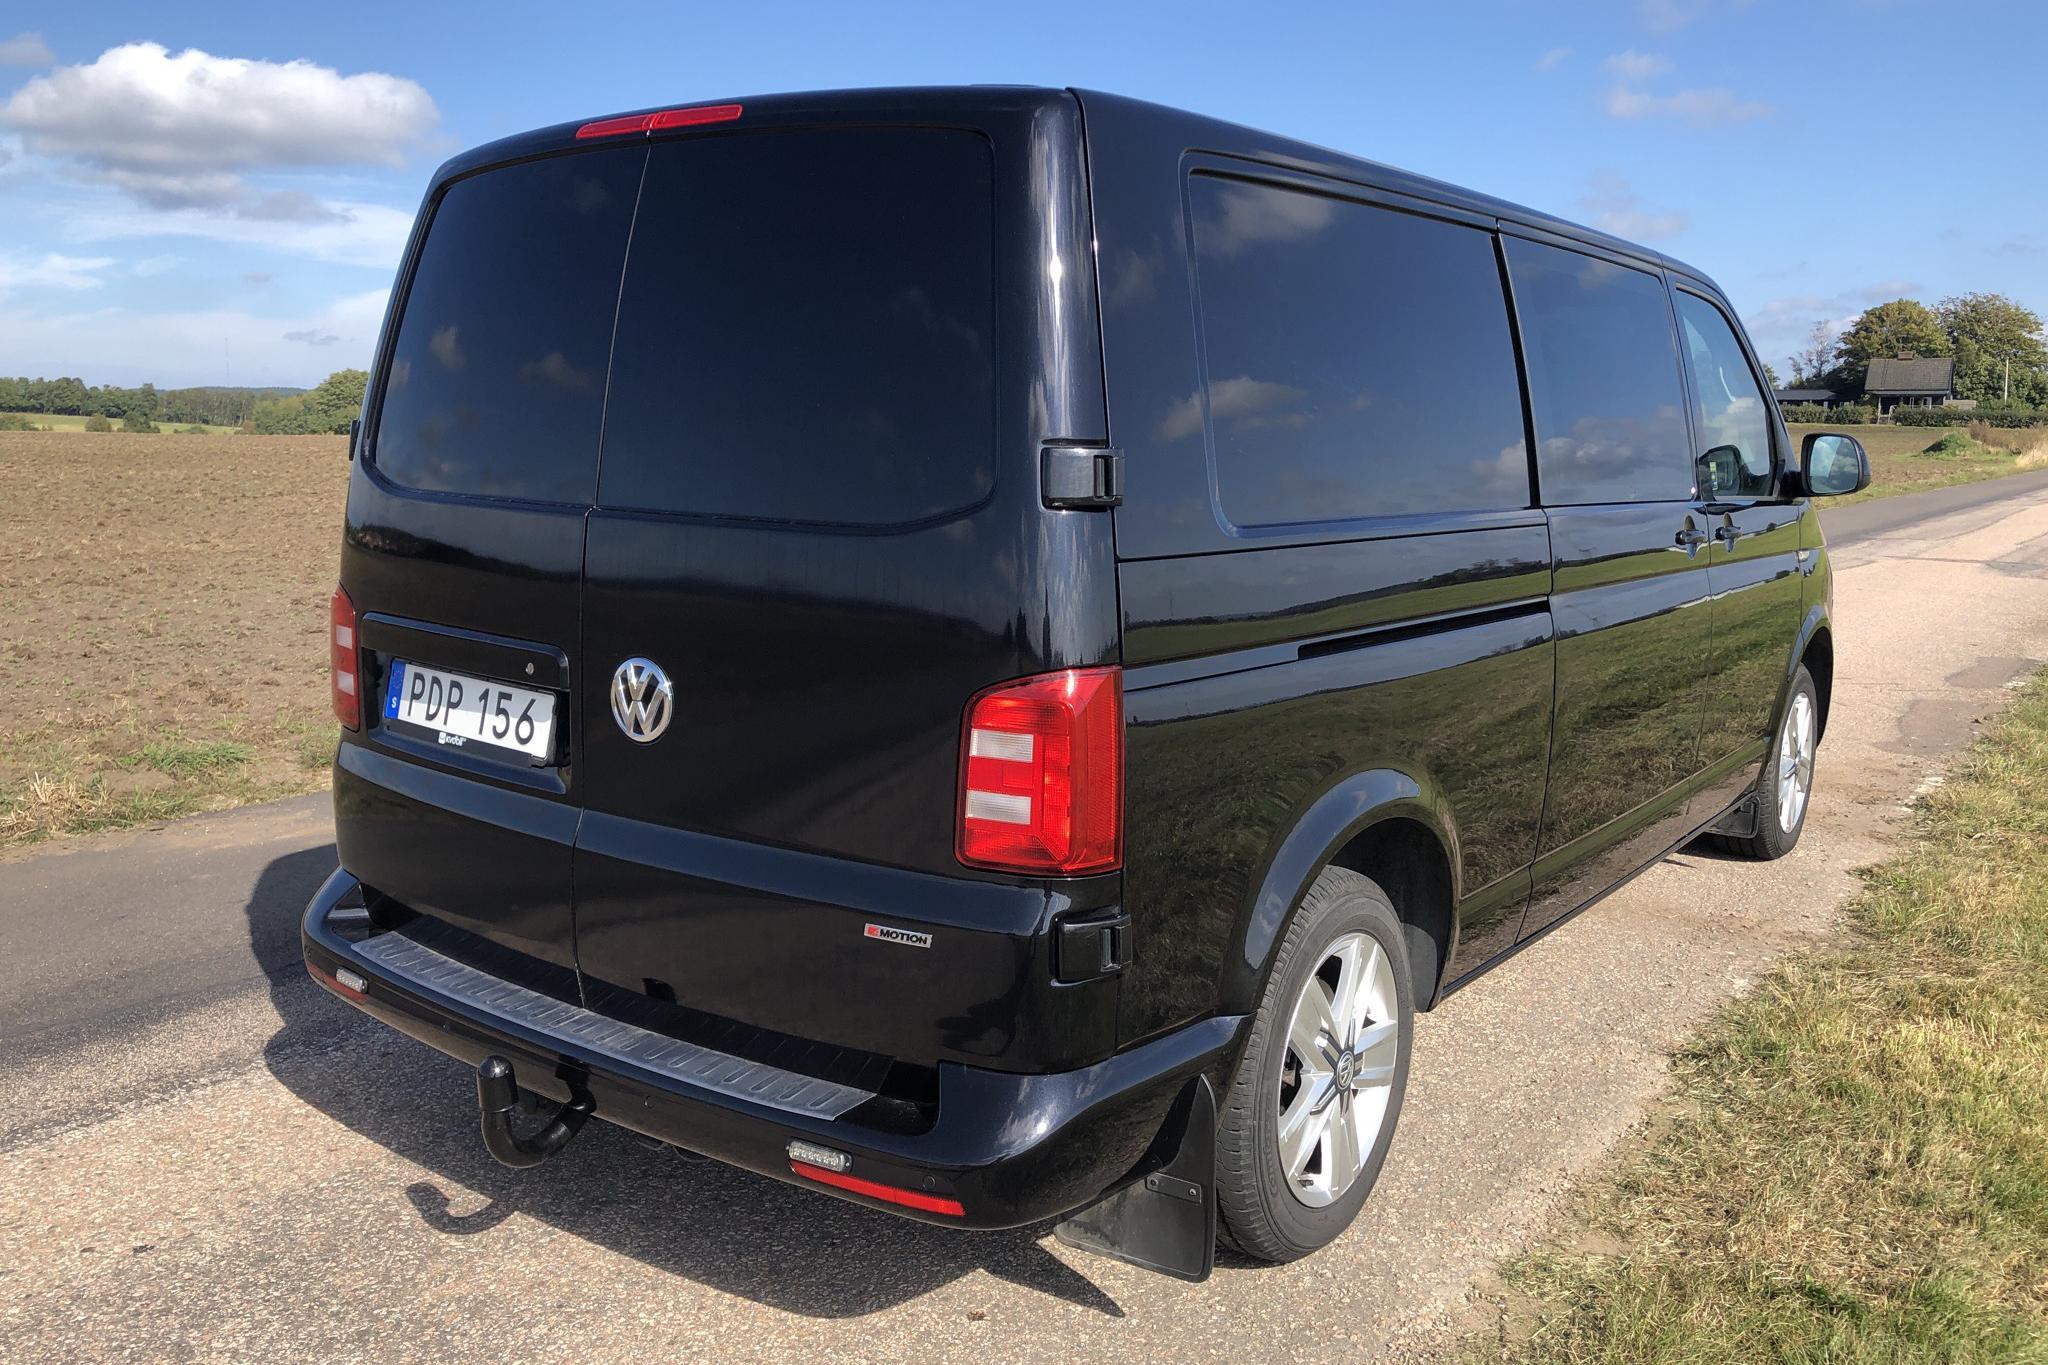 VW Transporter Kombi T6 2.0 TDI BMT 4MOTION (204hk) - 159 540 km - Automatic - black - 2017